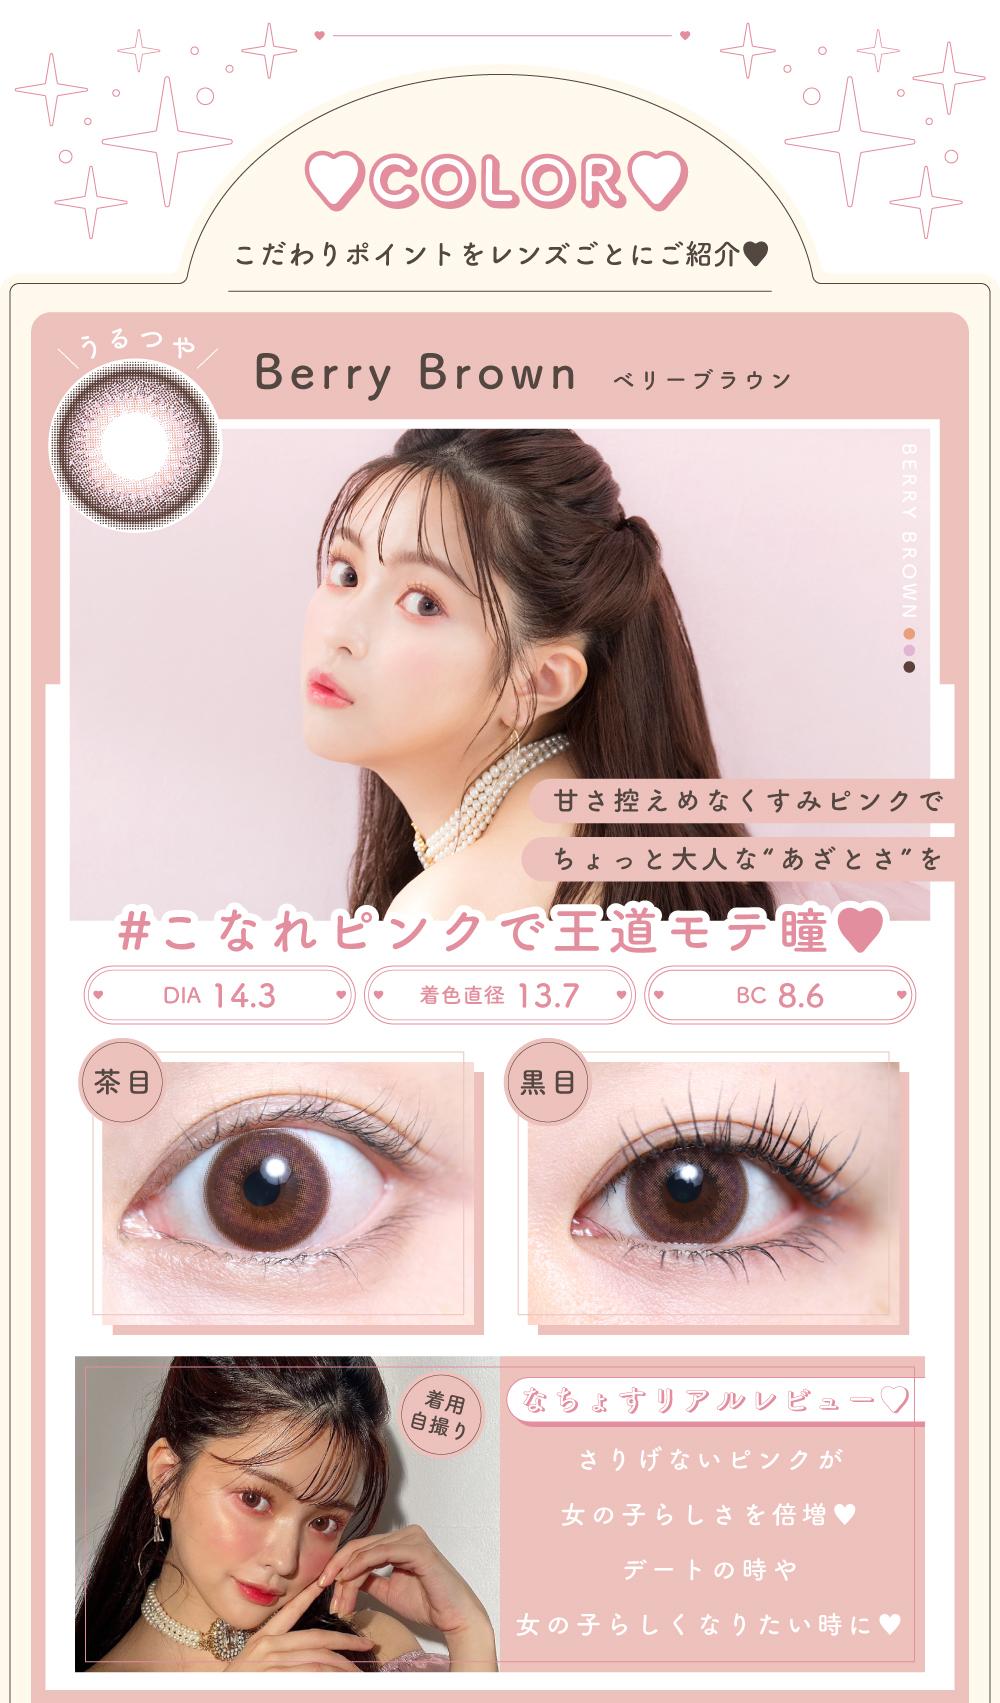 Berry Brown(ベリーブラウン)紹介